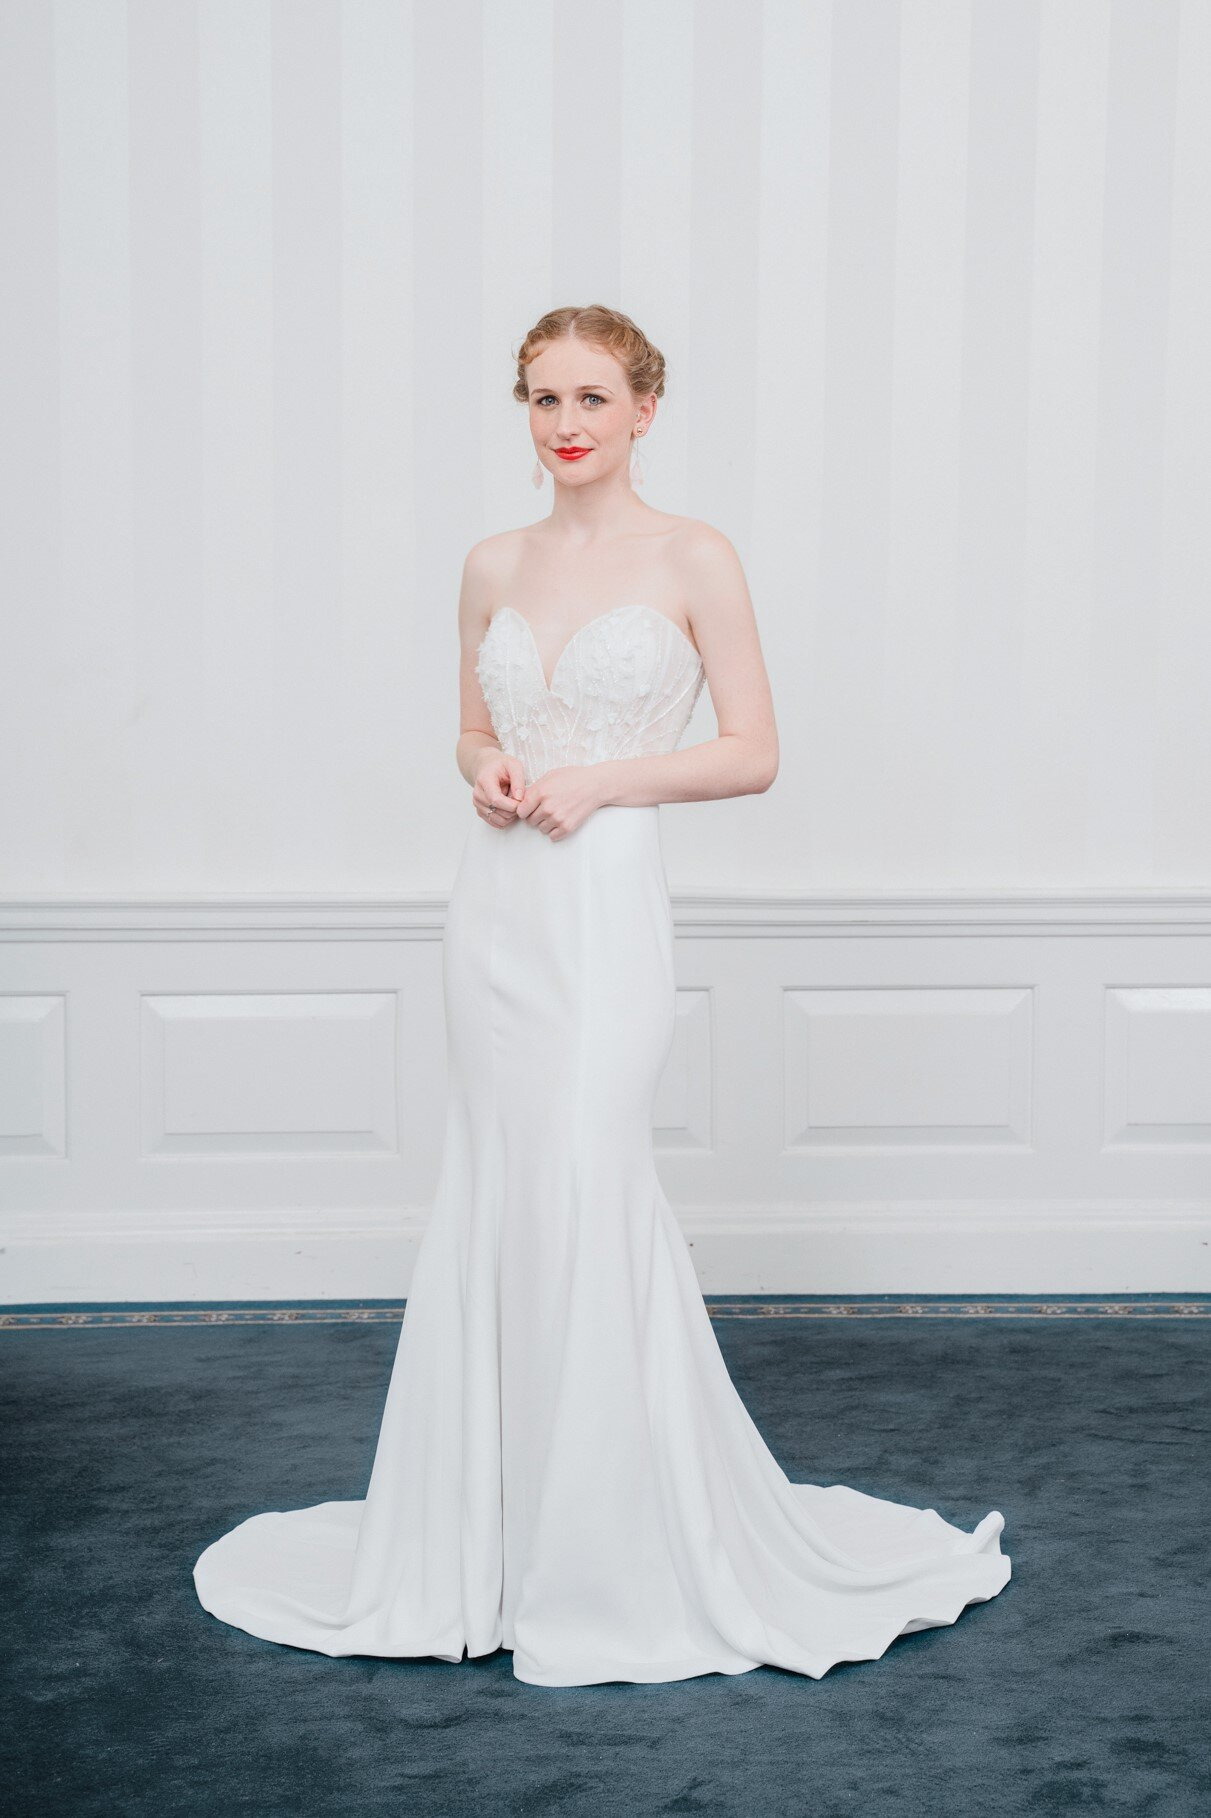 Bridal Shop Sydney Affordable Wedding Dresses Gowns Collection,Discount Wedding Dress Shops Uk